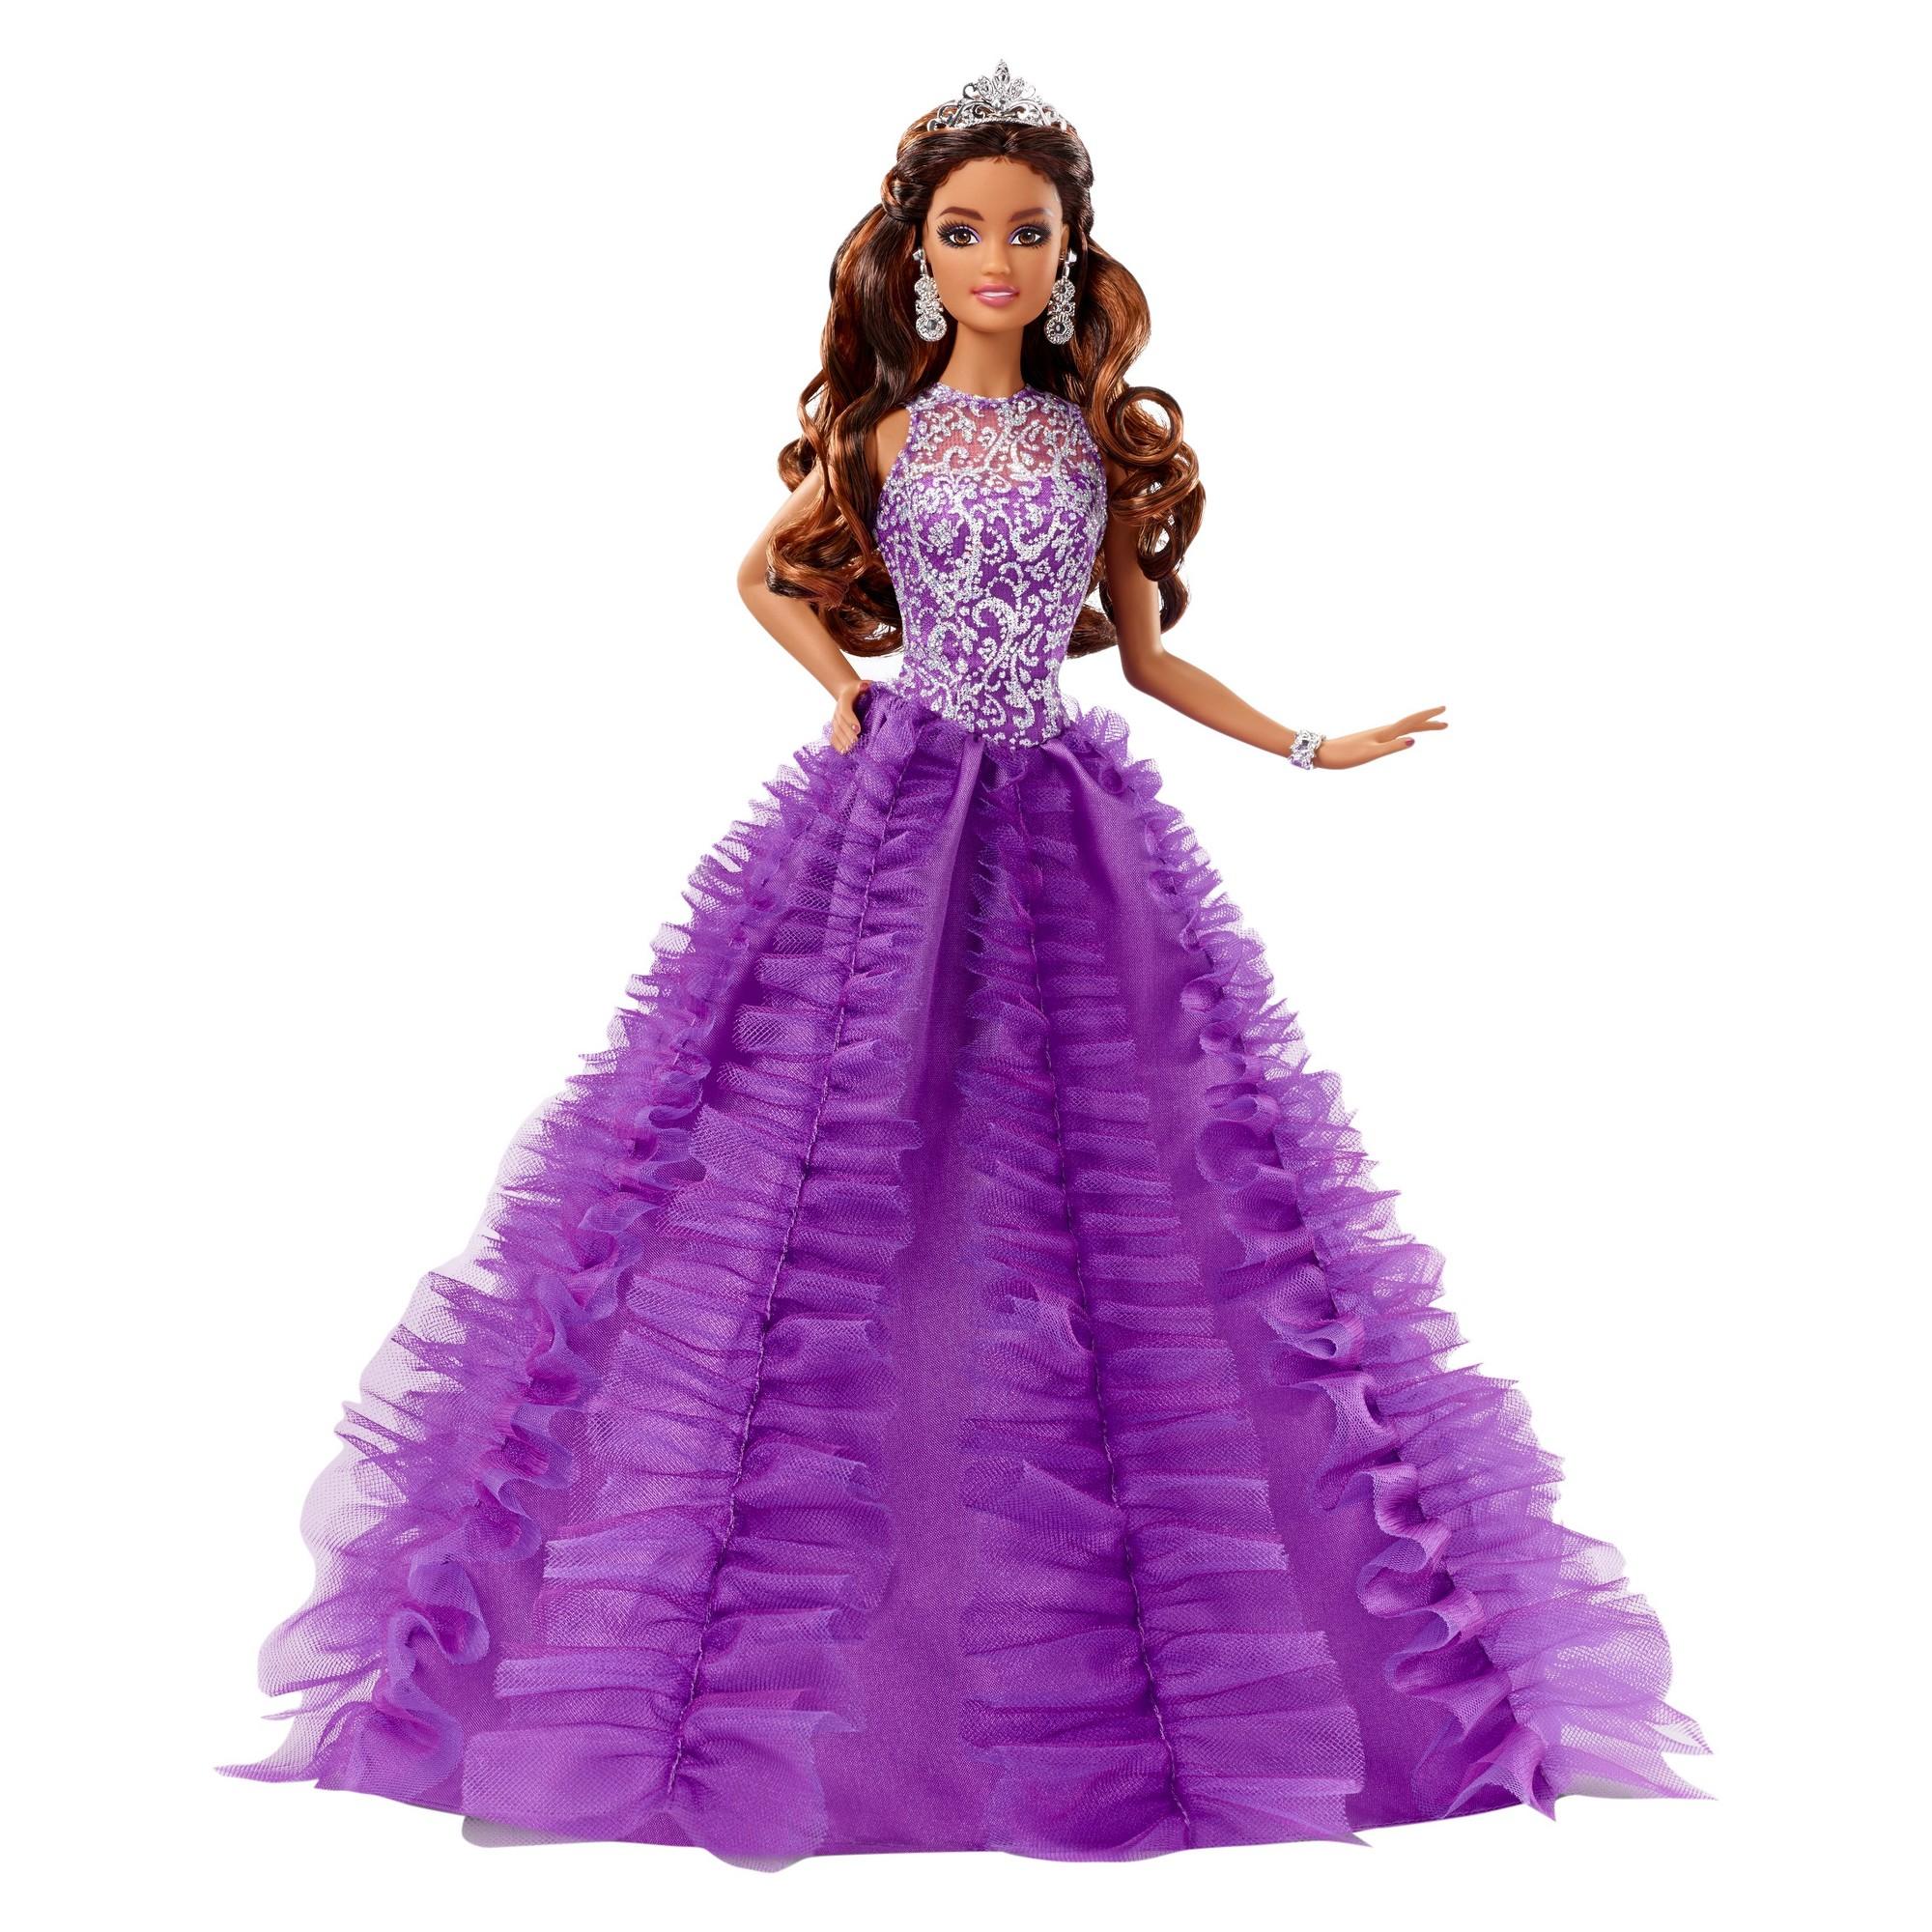 Barbie Collector Quinceanera Doll | Muñecas